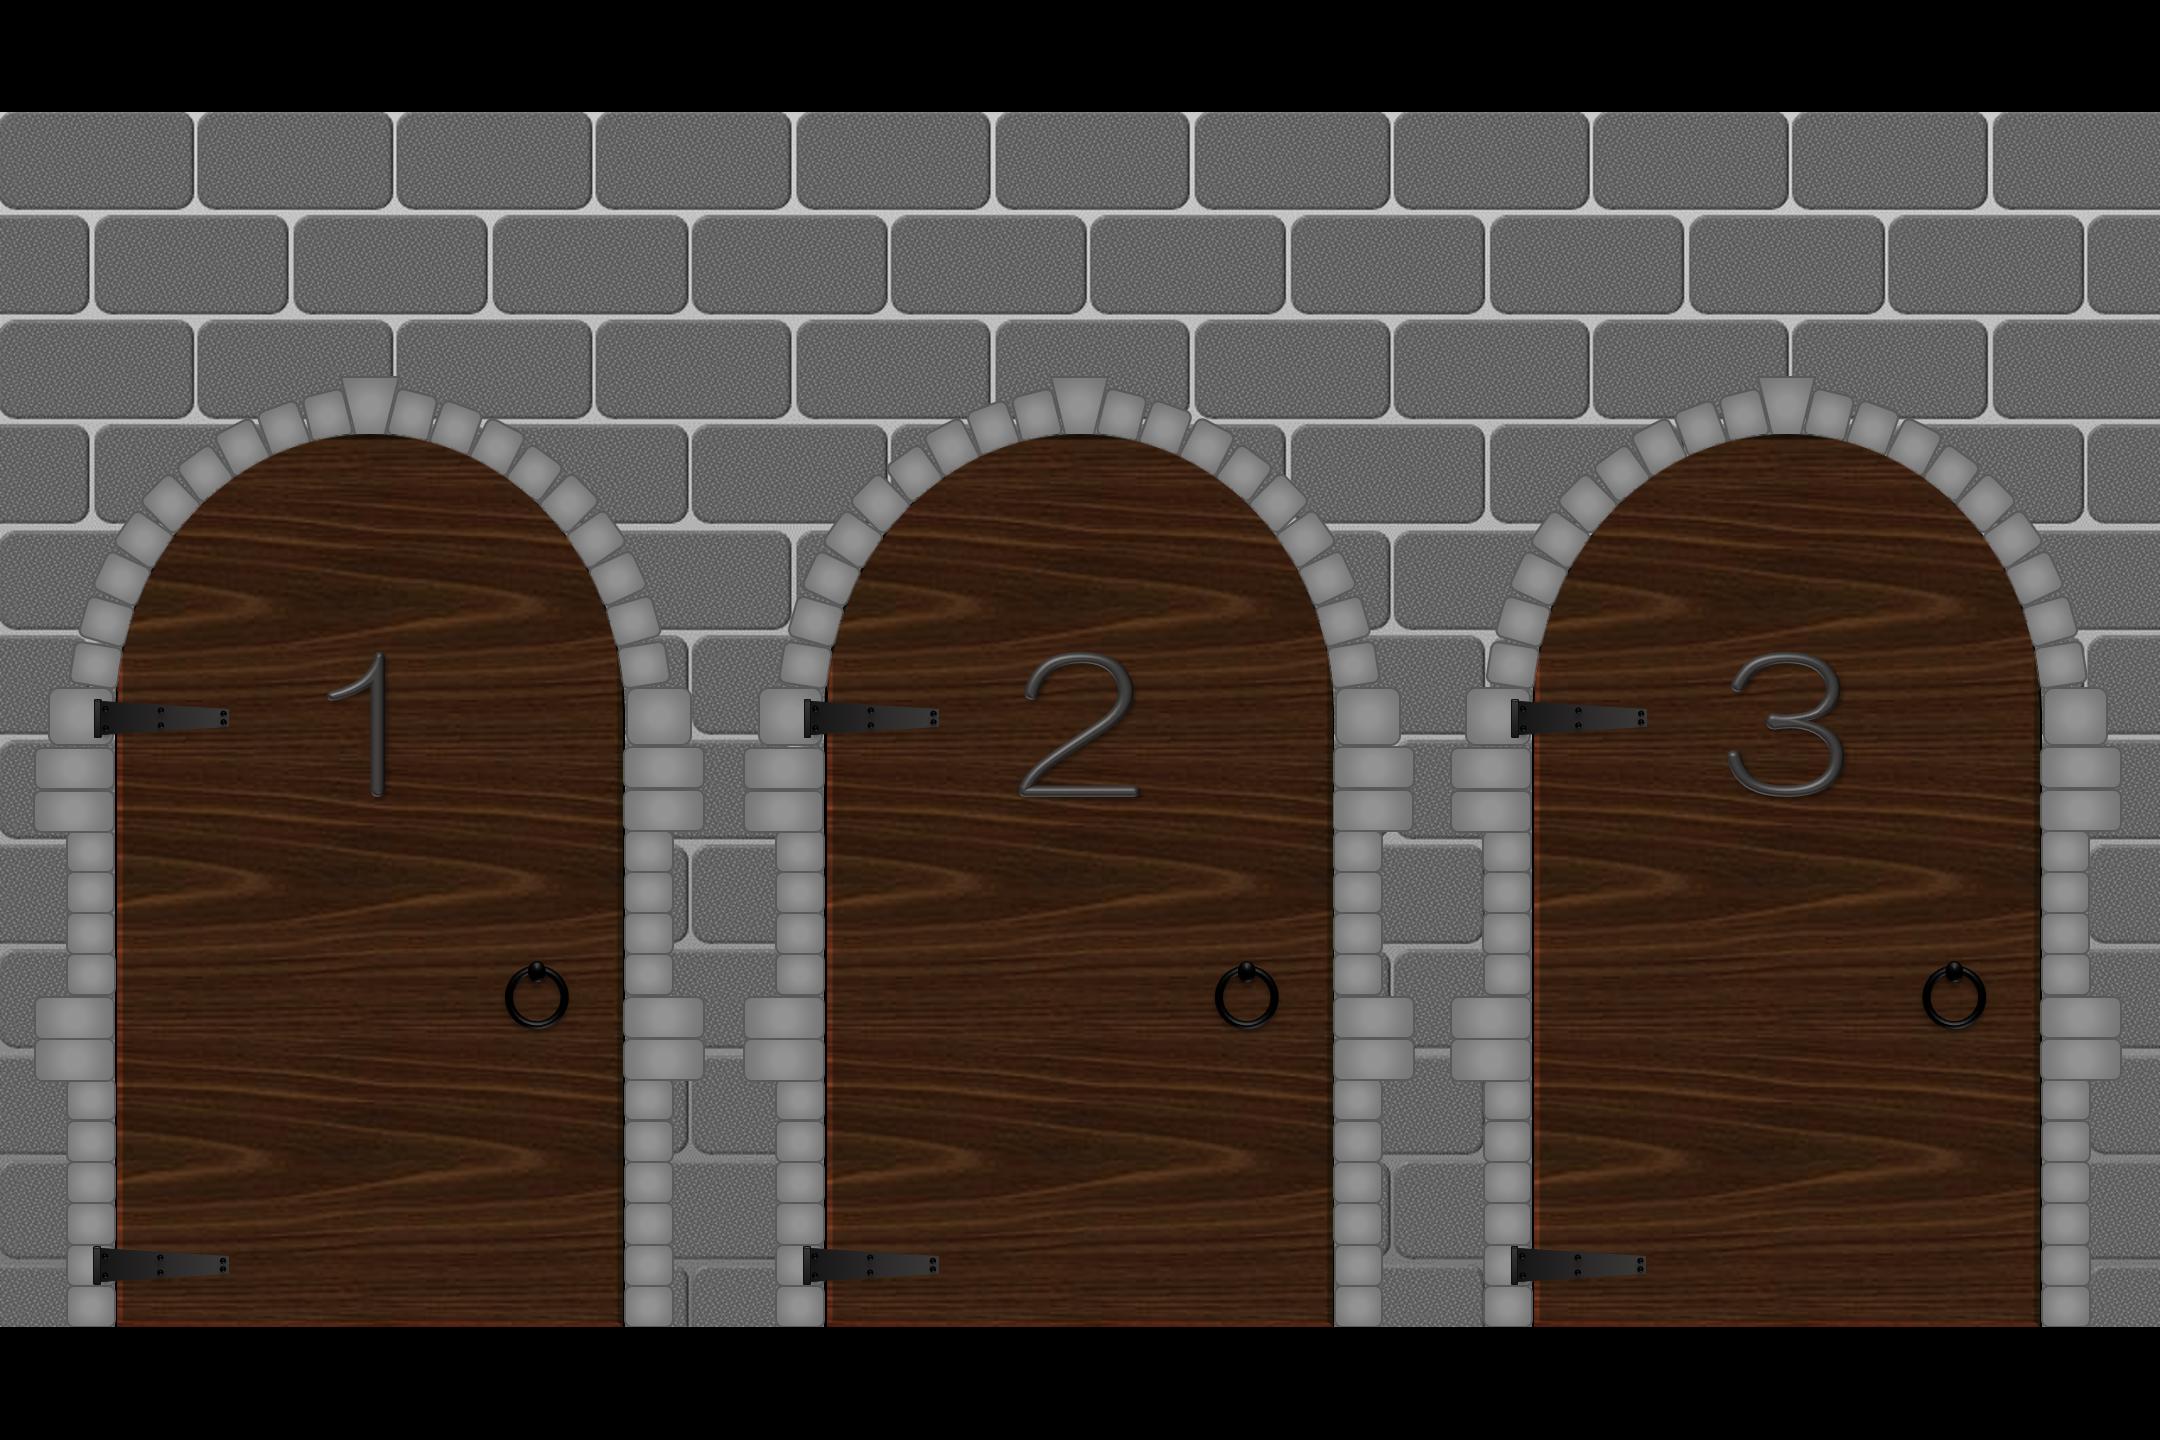 Download the Mystery Door Game  sc 1 st  tekhnologic - WordPress.com & The Mystery Door Game \u2013 tekhnologic